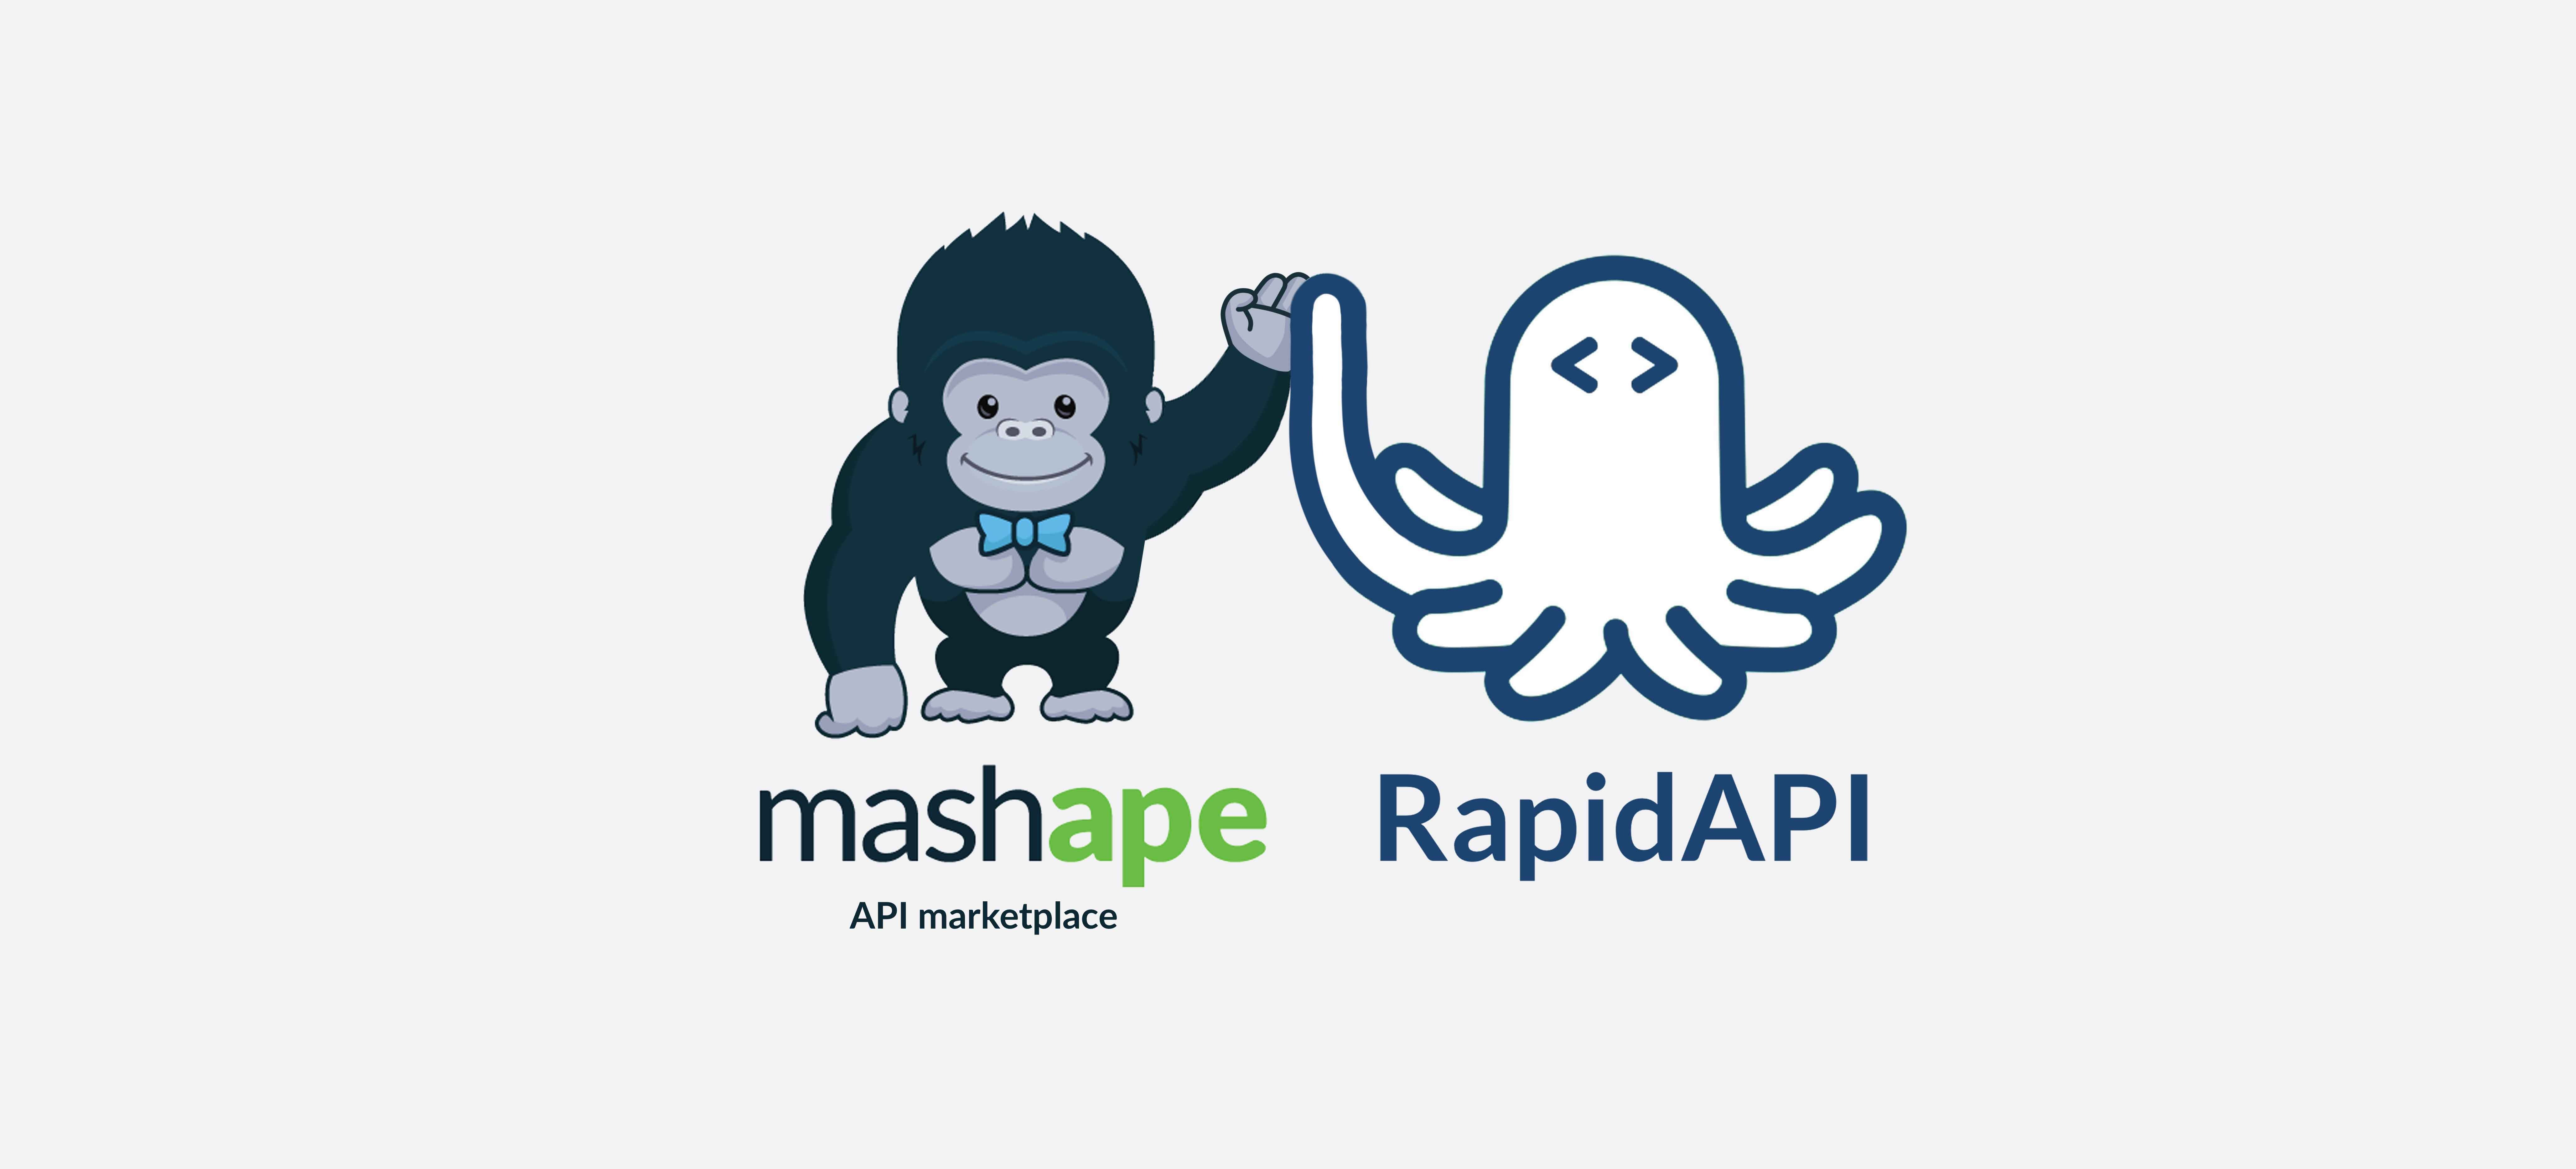 rapid_mashape-with-text